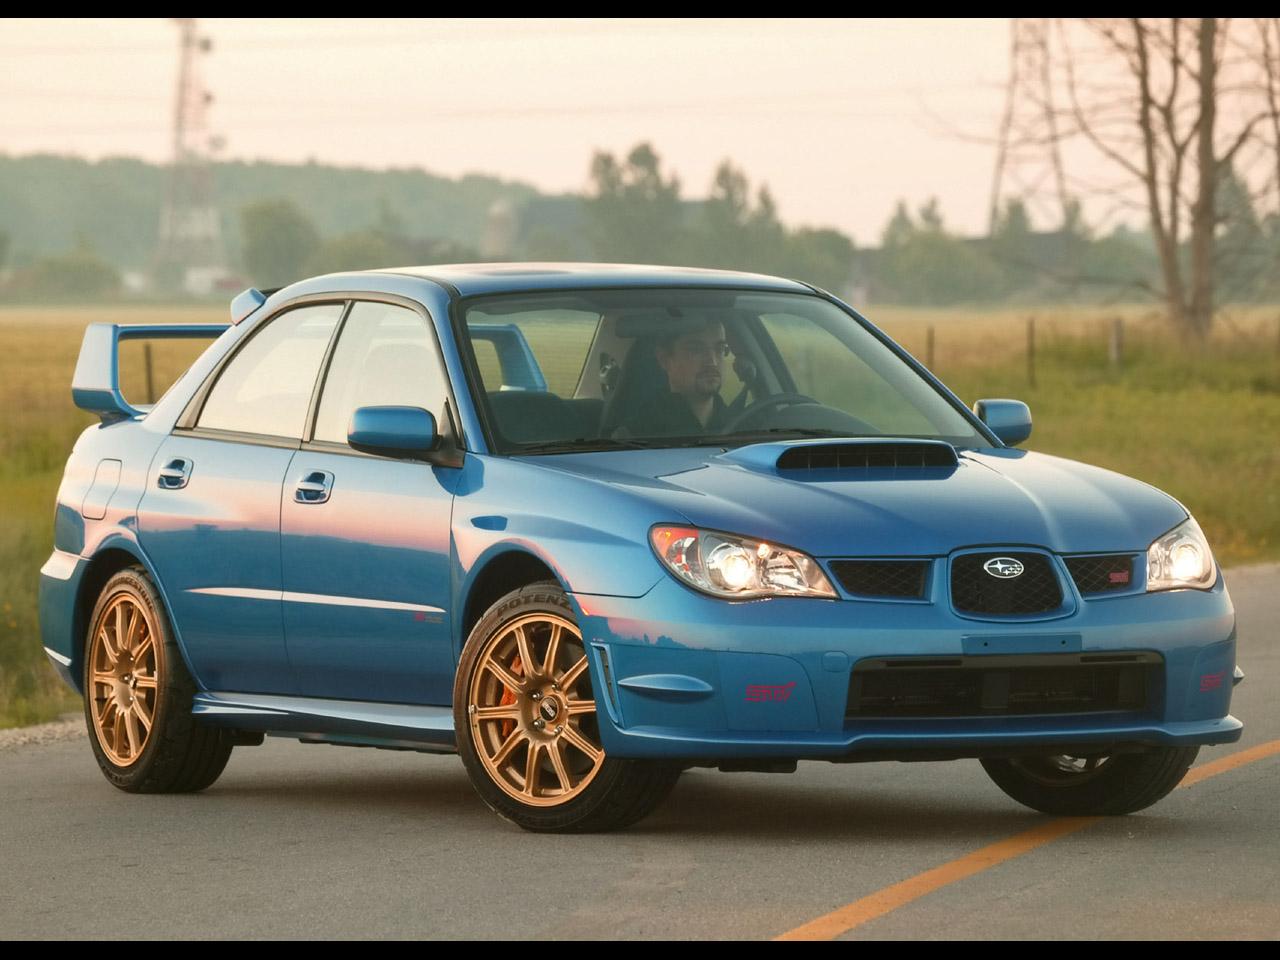 2006 Subaru Impreza Wrx Wallpaper Ir Performance